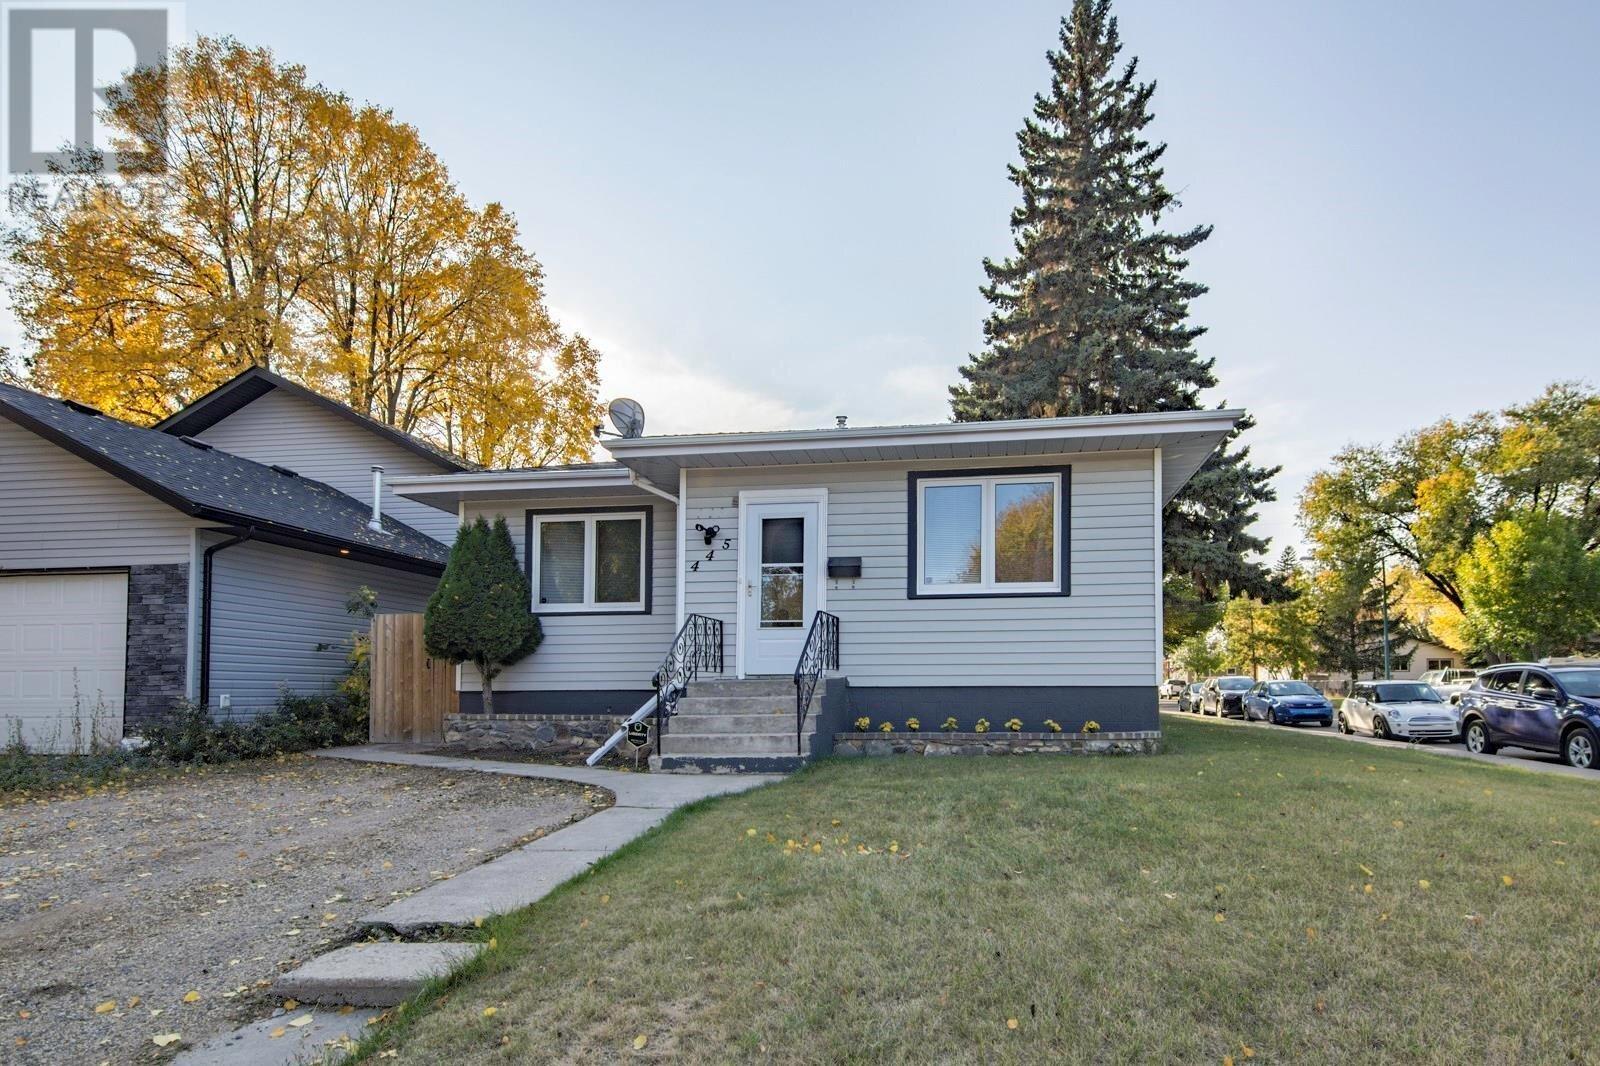 House for sale at 445 Q Ave N Saskatoon Saskatchewan - MLS: SK828585